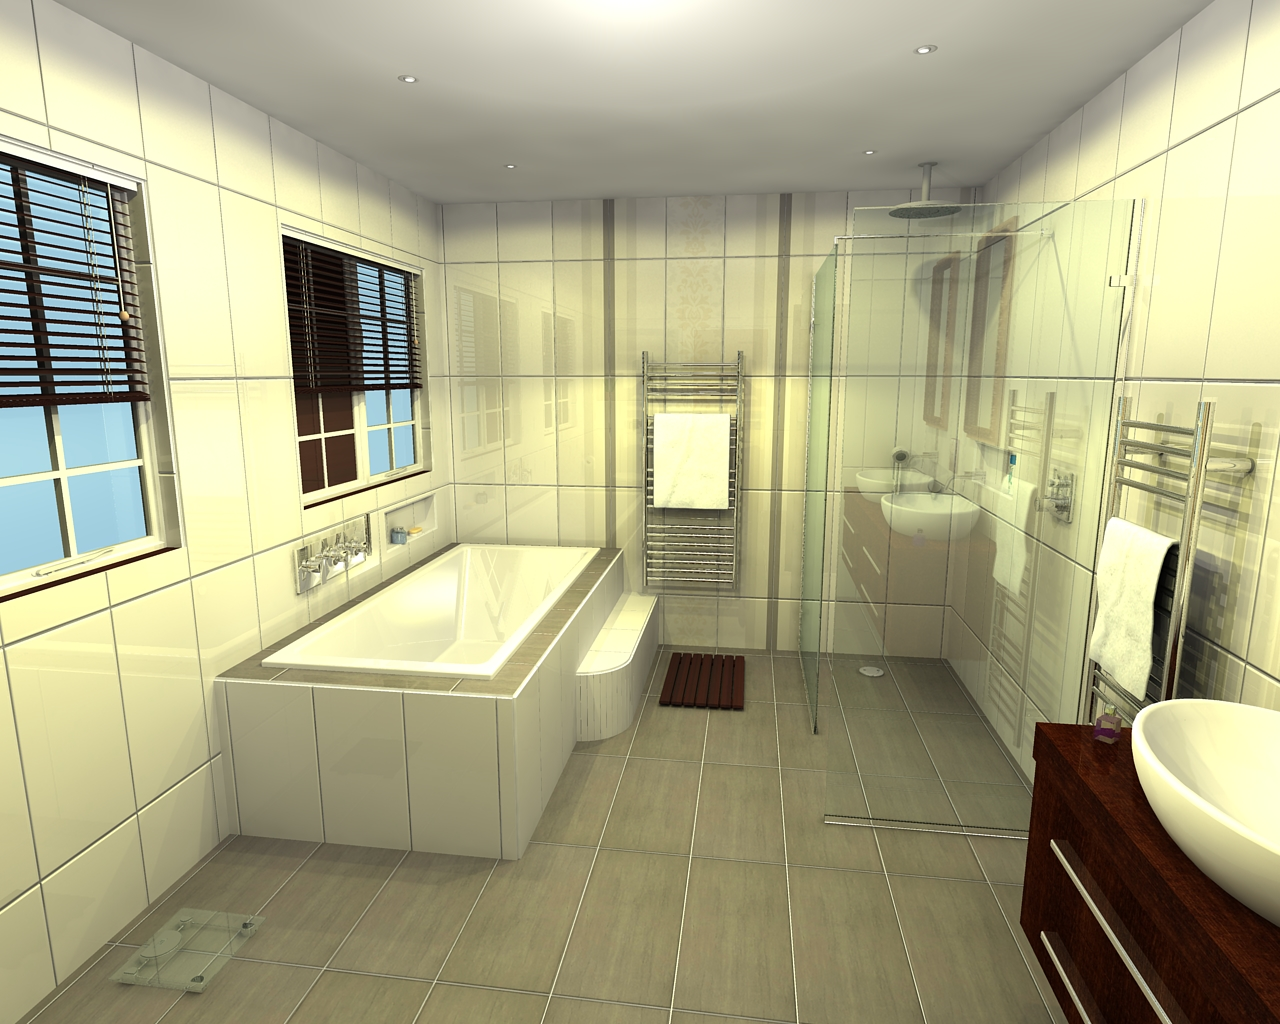 balinea bathroom design blog wet rooms and walk in showers. Black Bedroom Furniture Sets. Home Design Ideas